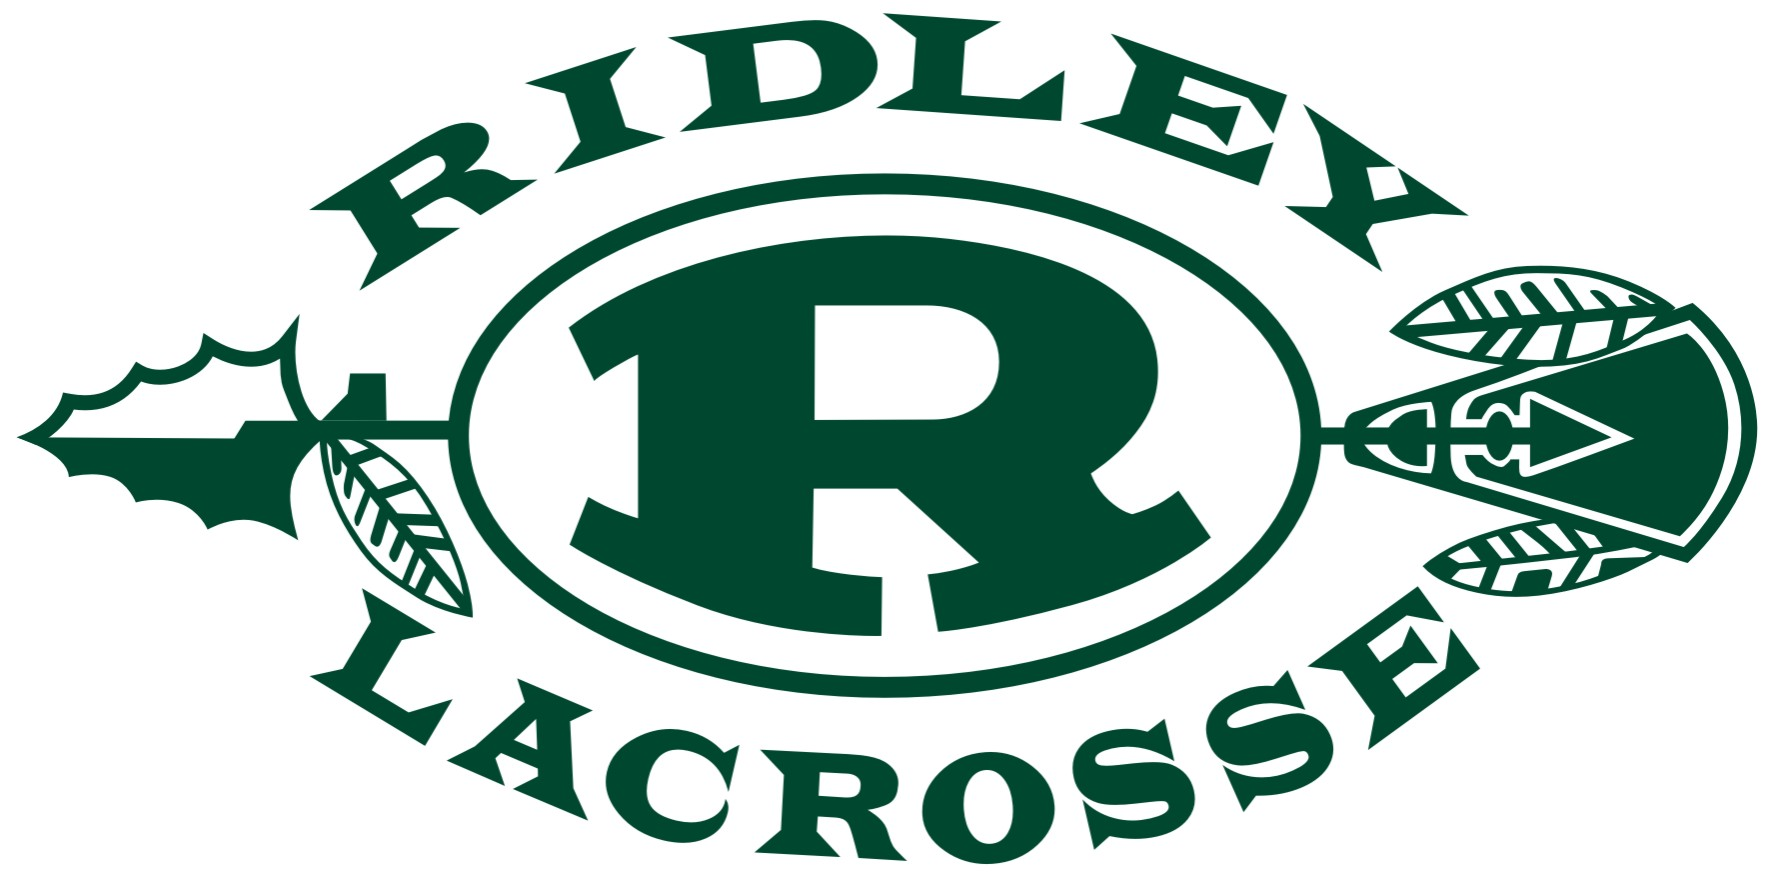 RidleyLax-Logo-Green-GreenLetters.jpg